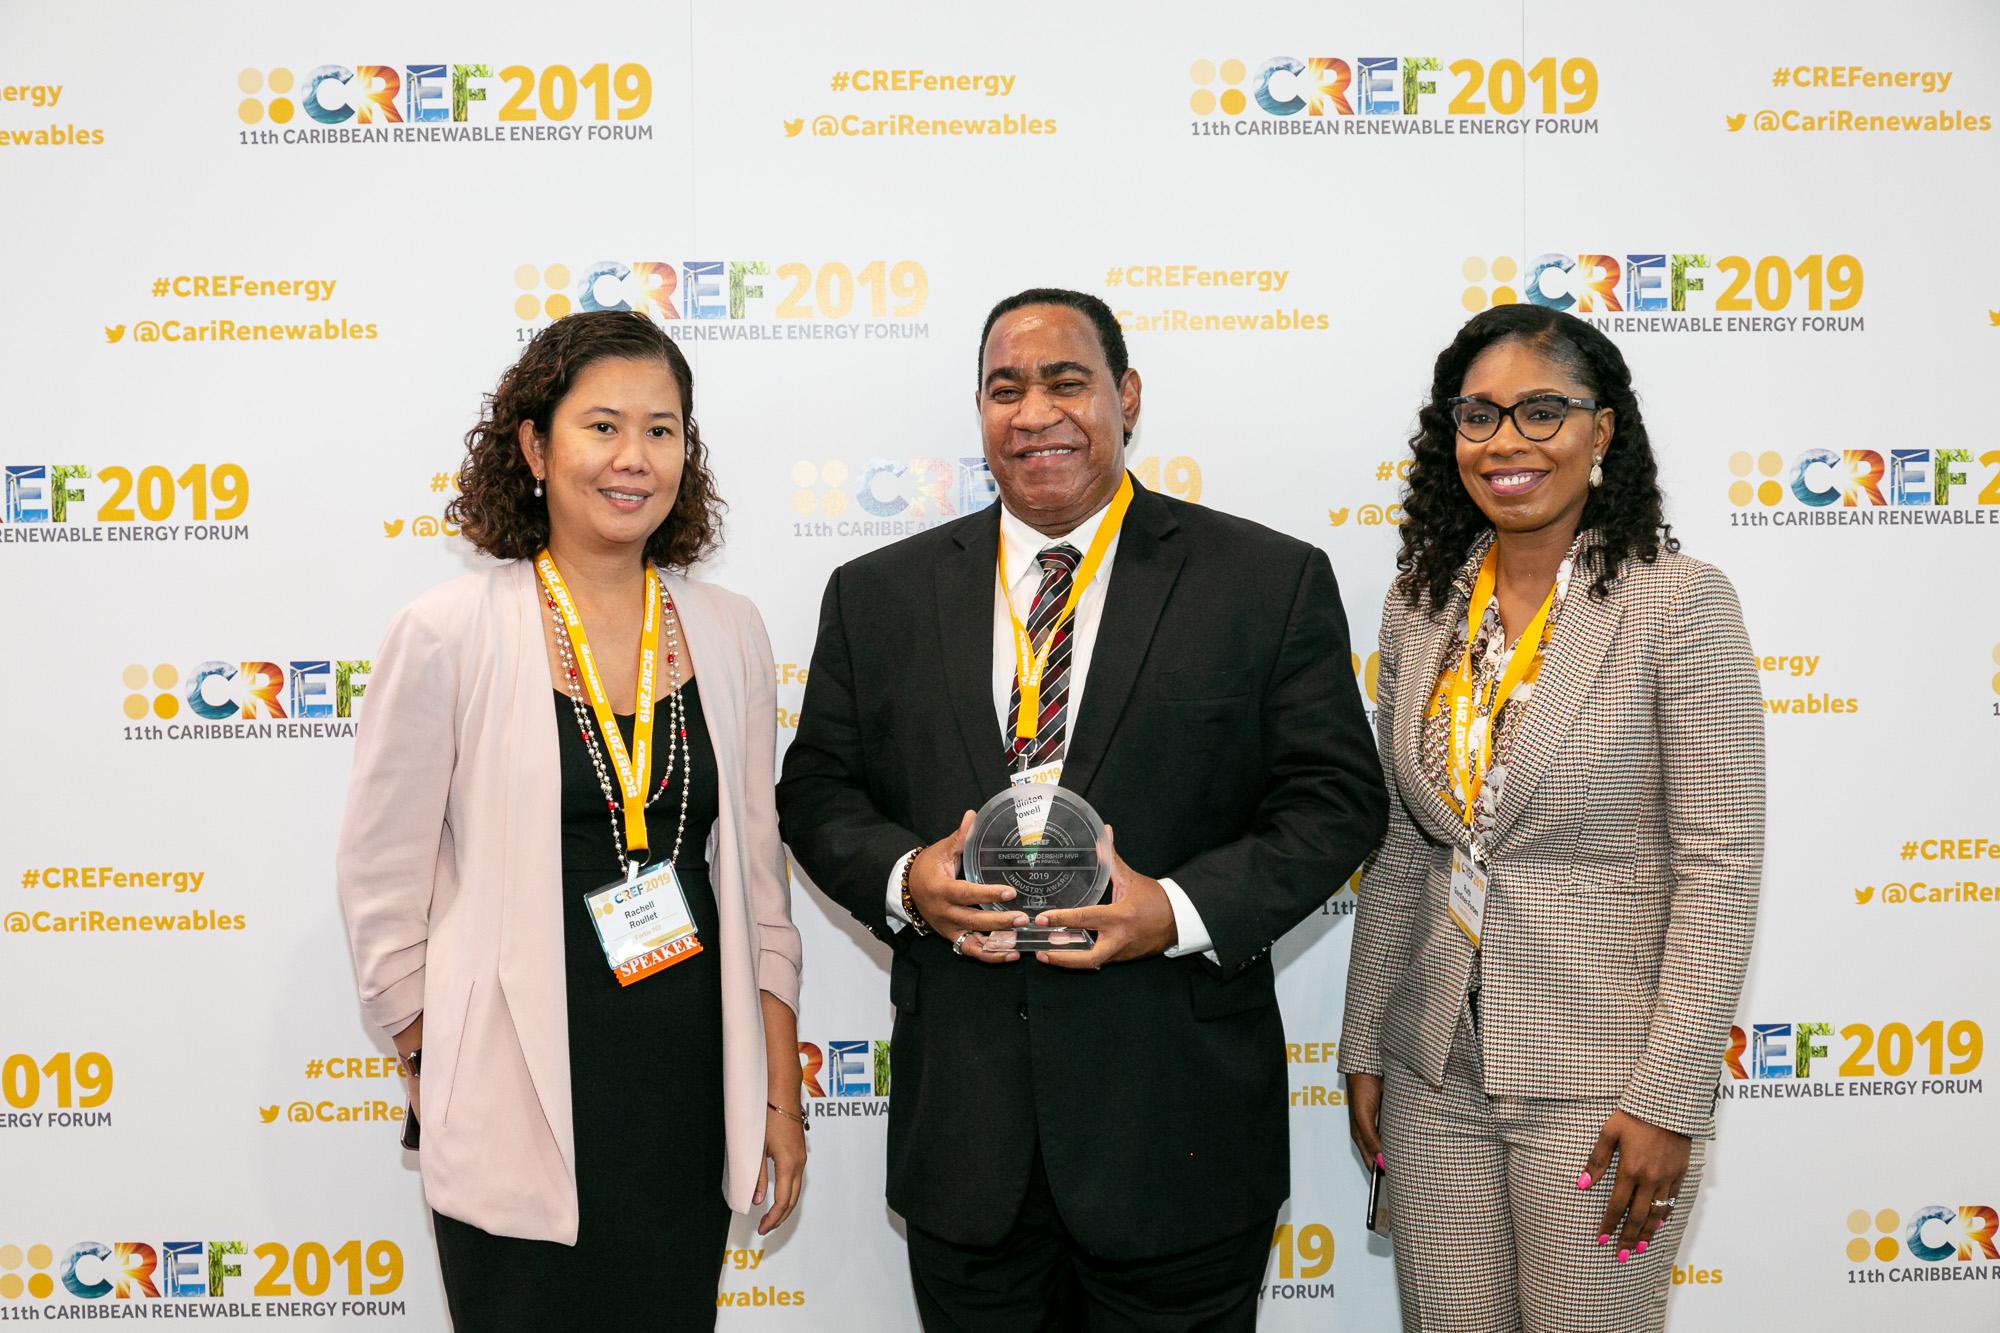 CREF 2019: Awards Ceremony